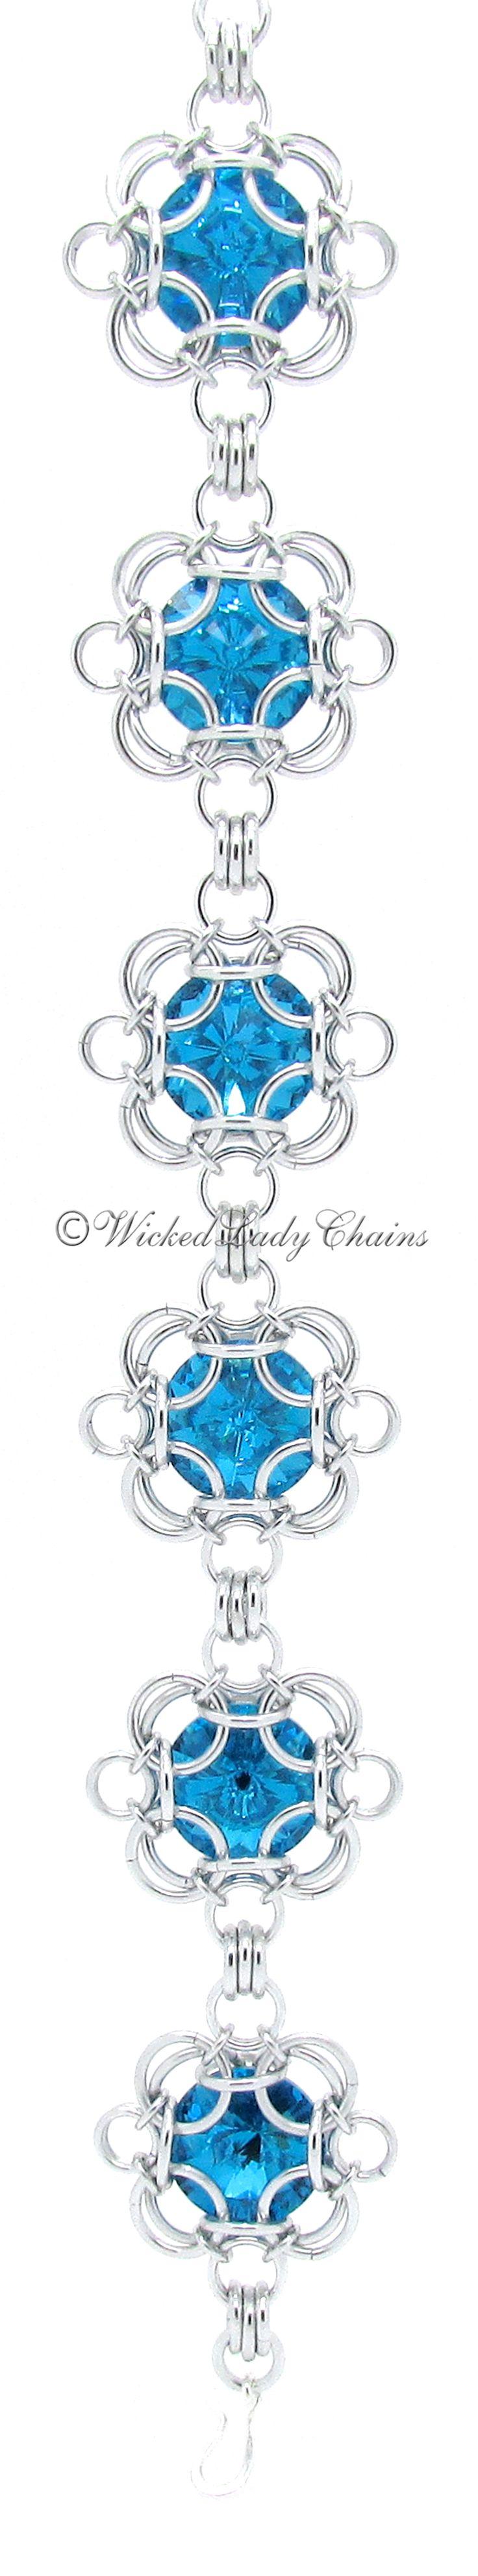 Aqua crystal rivoli bracelet in jewellers grade anodised aluminium.  Original tutorial used can be found here: https://www.etsy.com/listing/250690726/rivoli-power?ref=shop_home_active_1